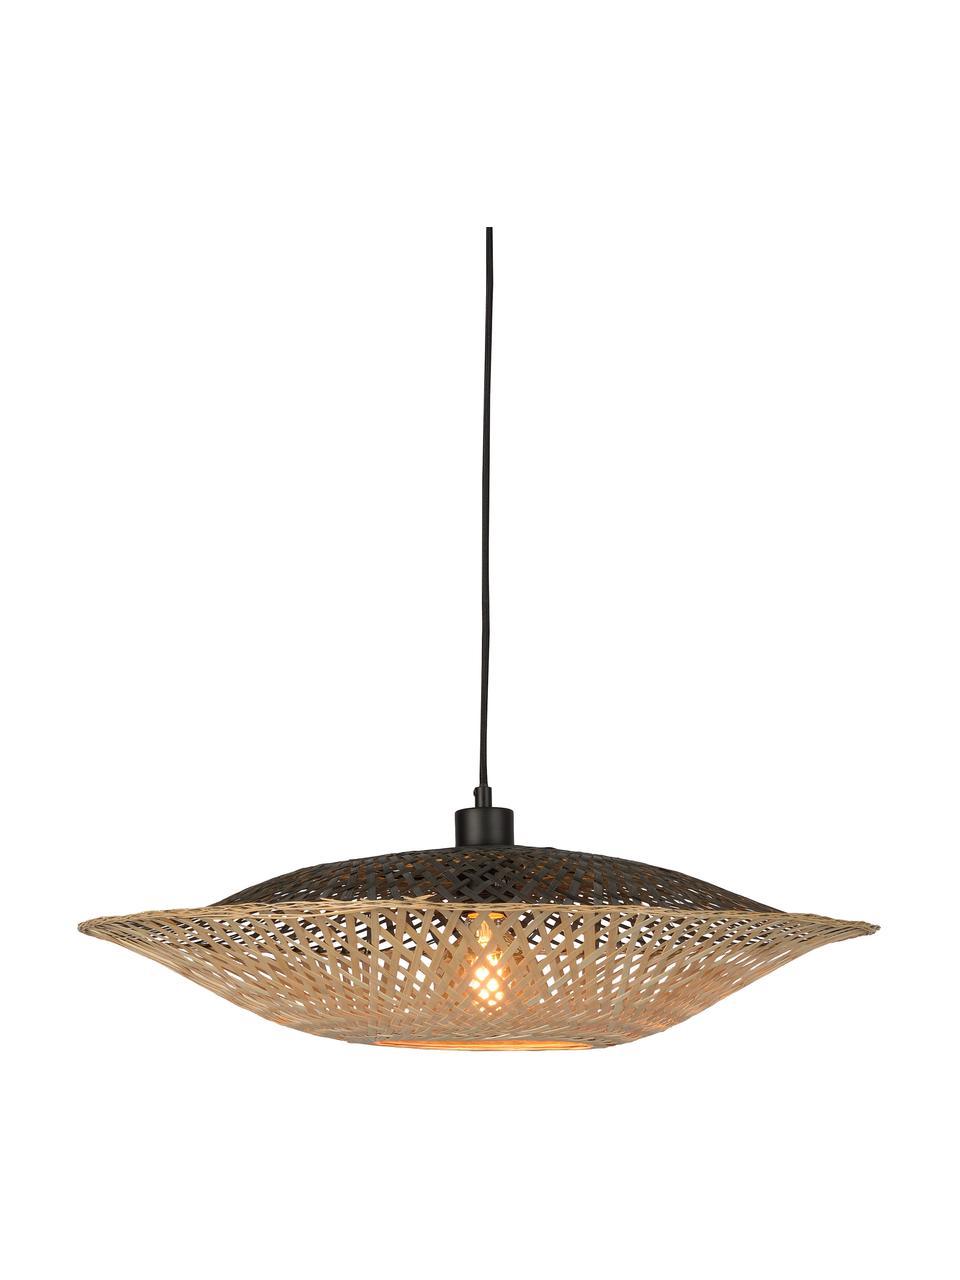 Lampada a sospensione in bambù Kalimantan, Paralume: bambù, Baldacchino: materiale sintetico, Bambù, nero, Ø 60 x Alt. 15 cm